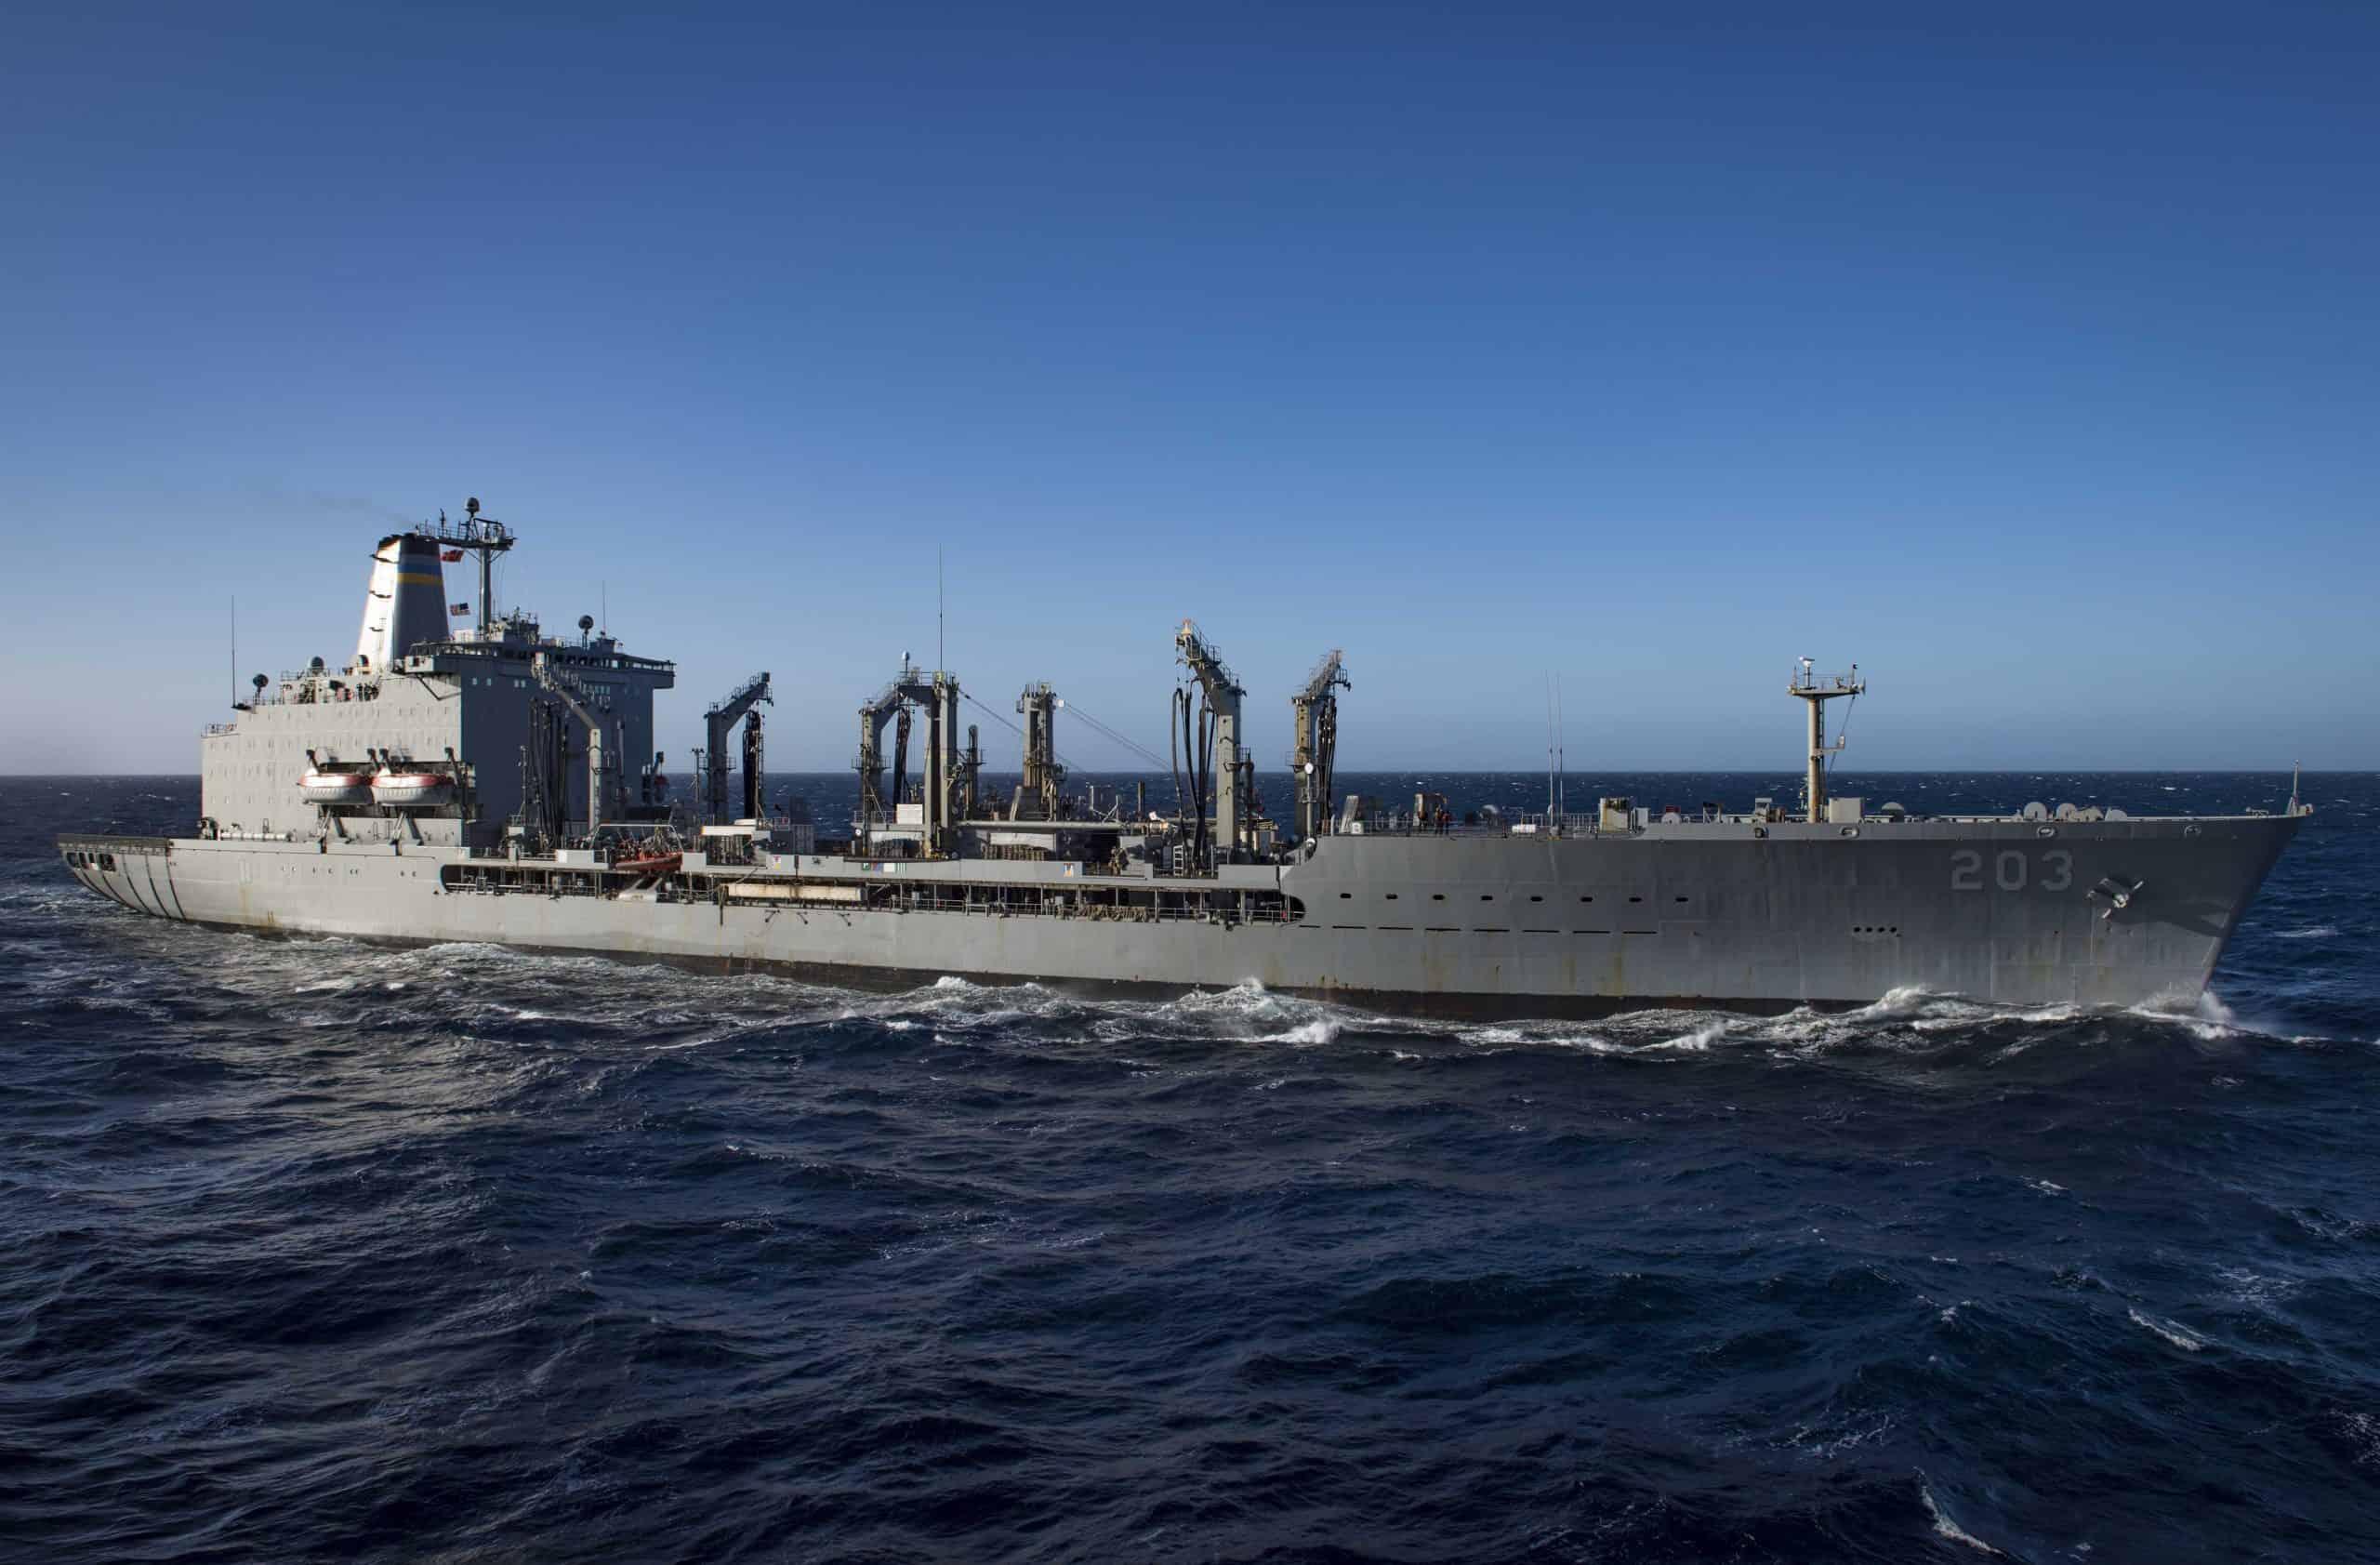 Корабель комплексного забезпечення USNS Laramie (T-AO 203) ВМФ США